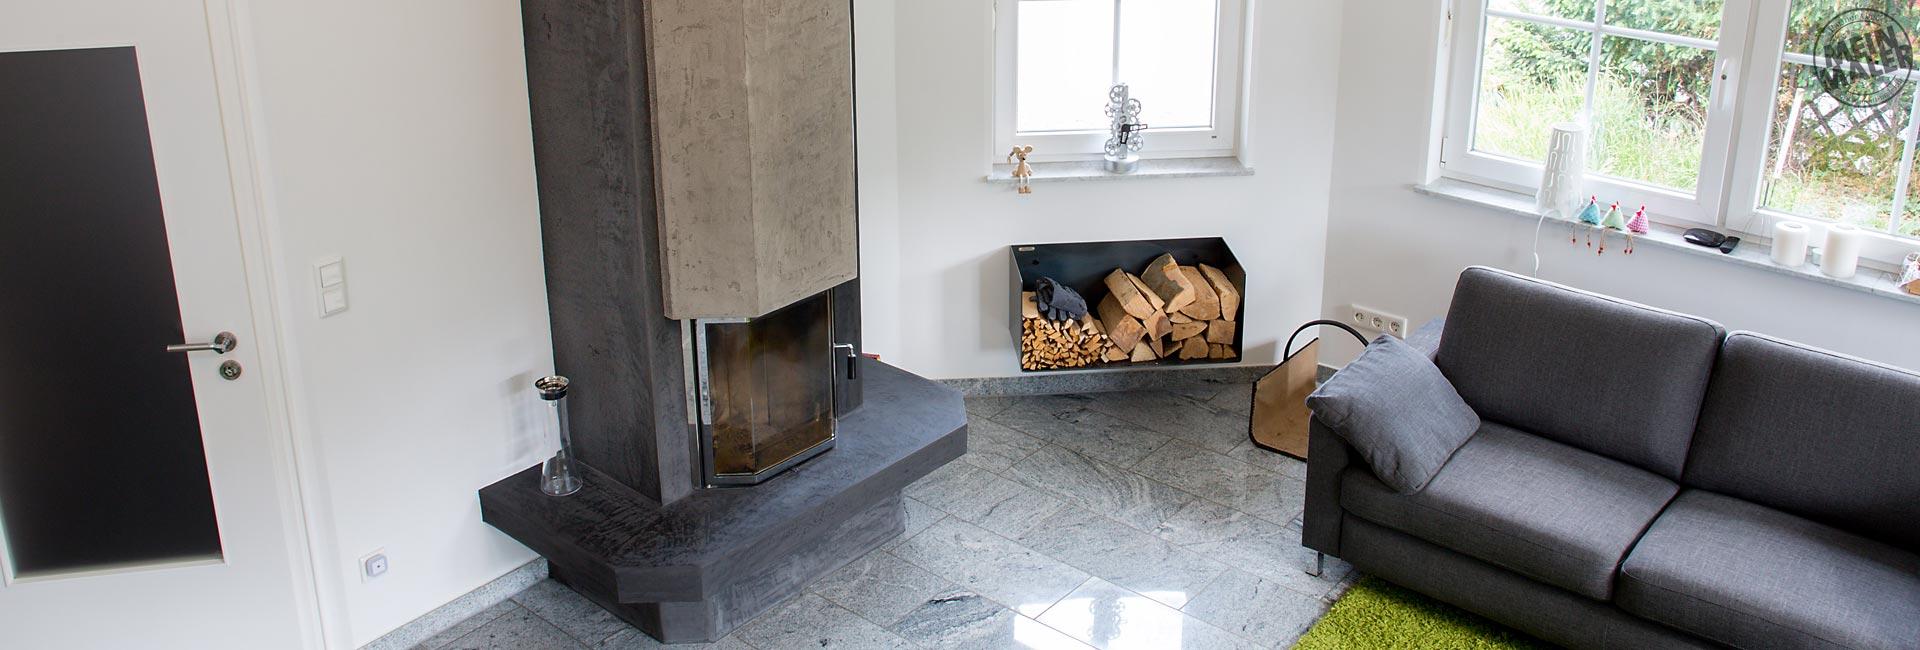 report malerarbeiten treppe wei lackieren kamin in betonoptik fugenloser fu boden in. Black Bedroom Furniture Sets. Home Design Ideas